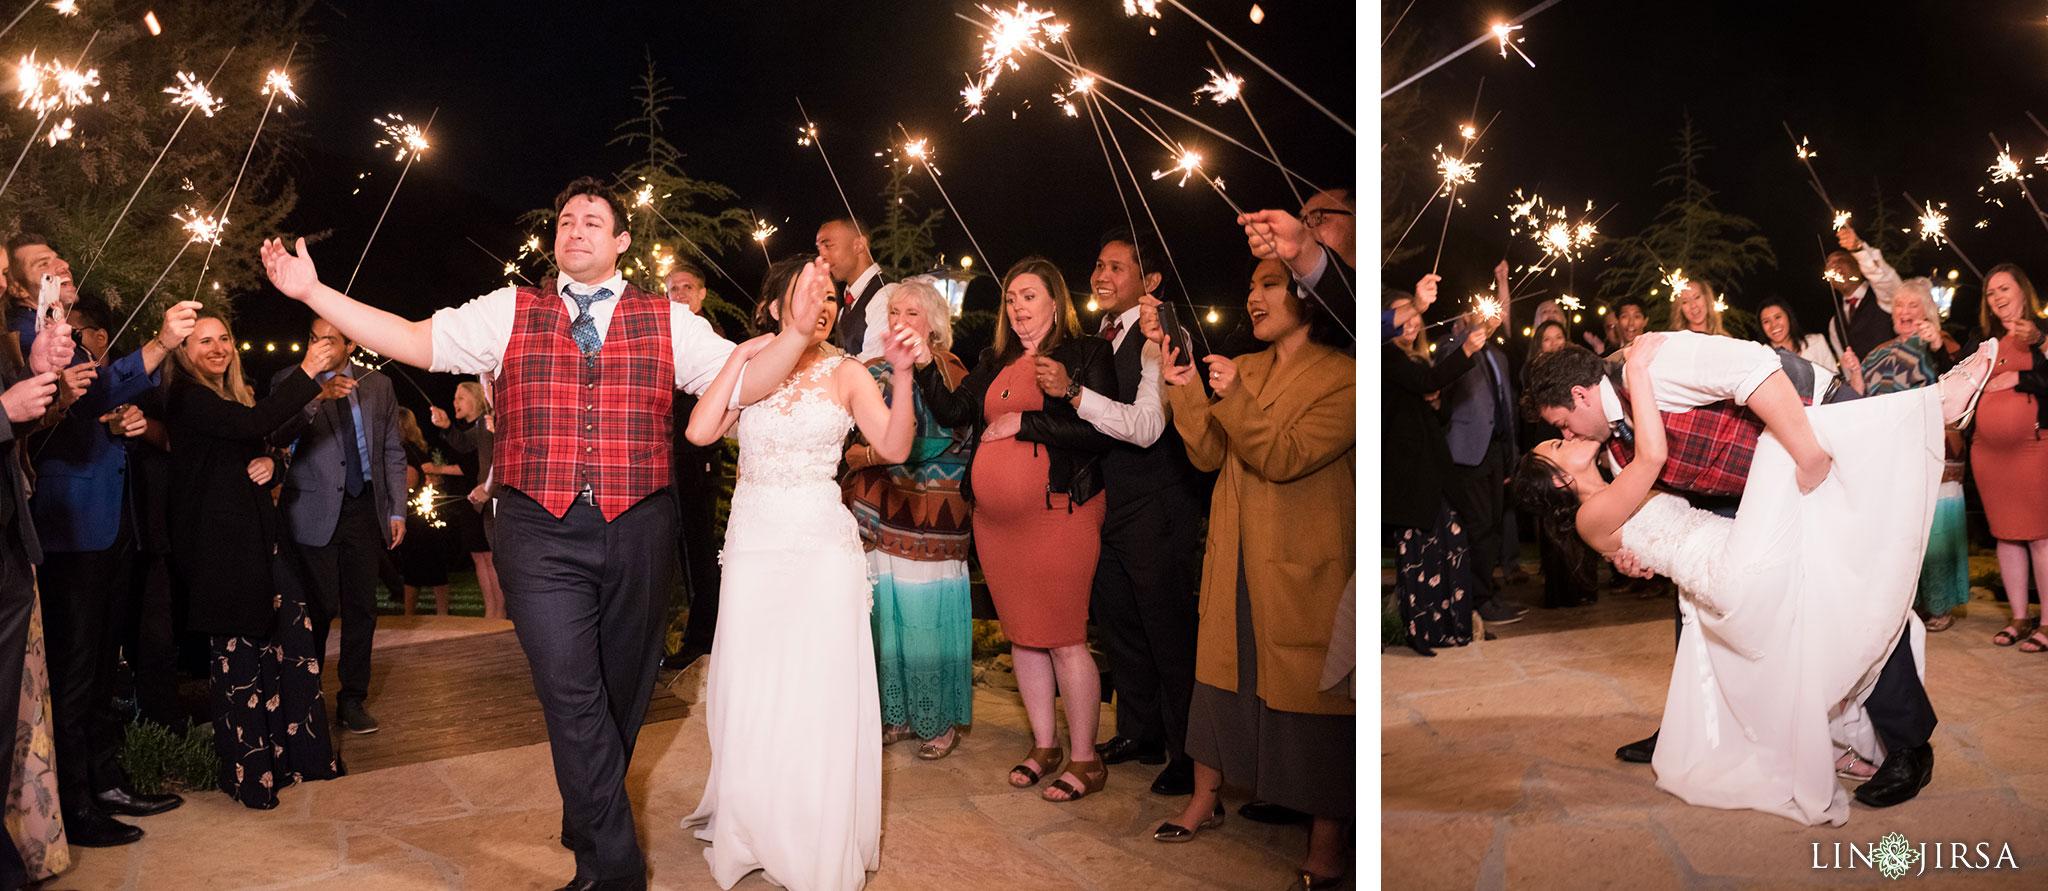 32 serendipity gardens oak glen wedding reception photography